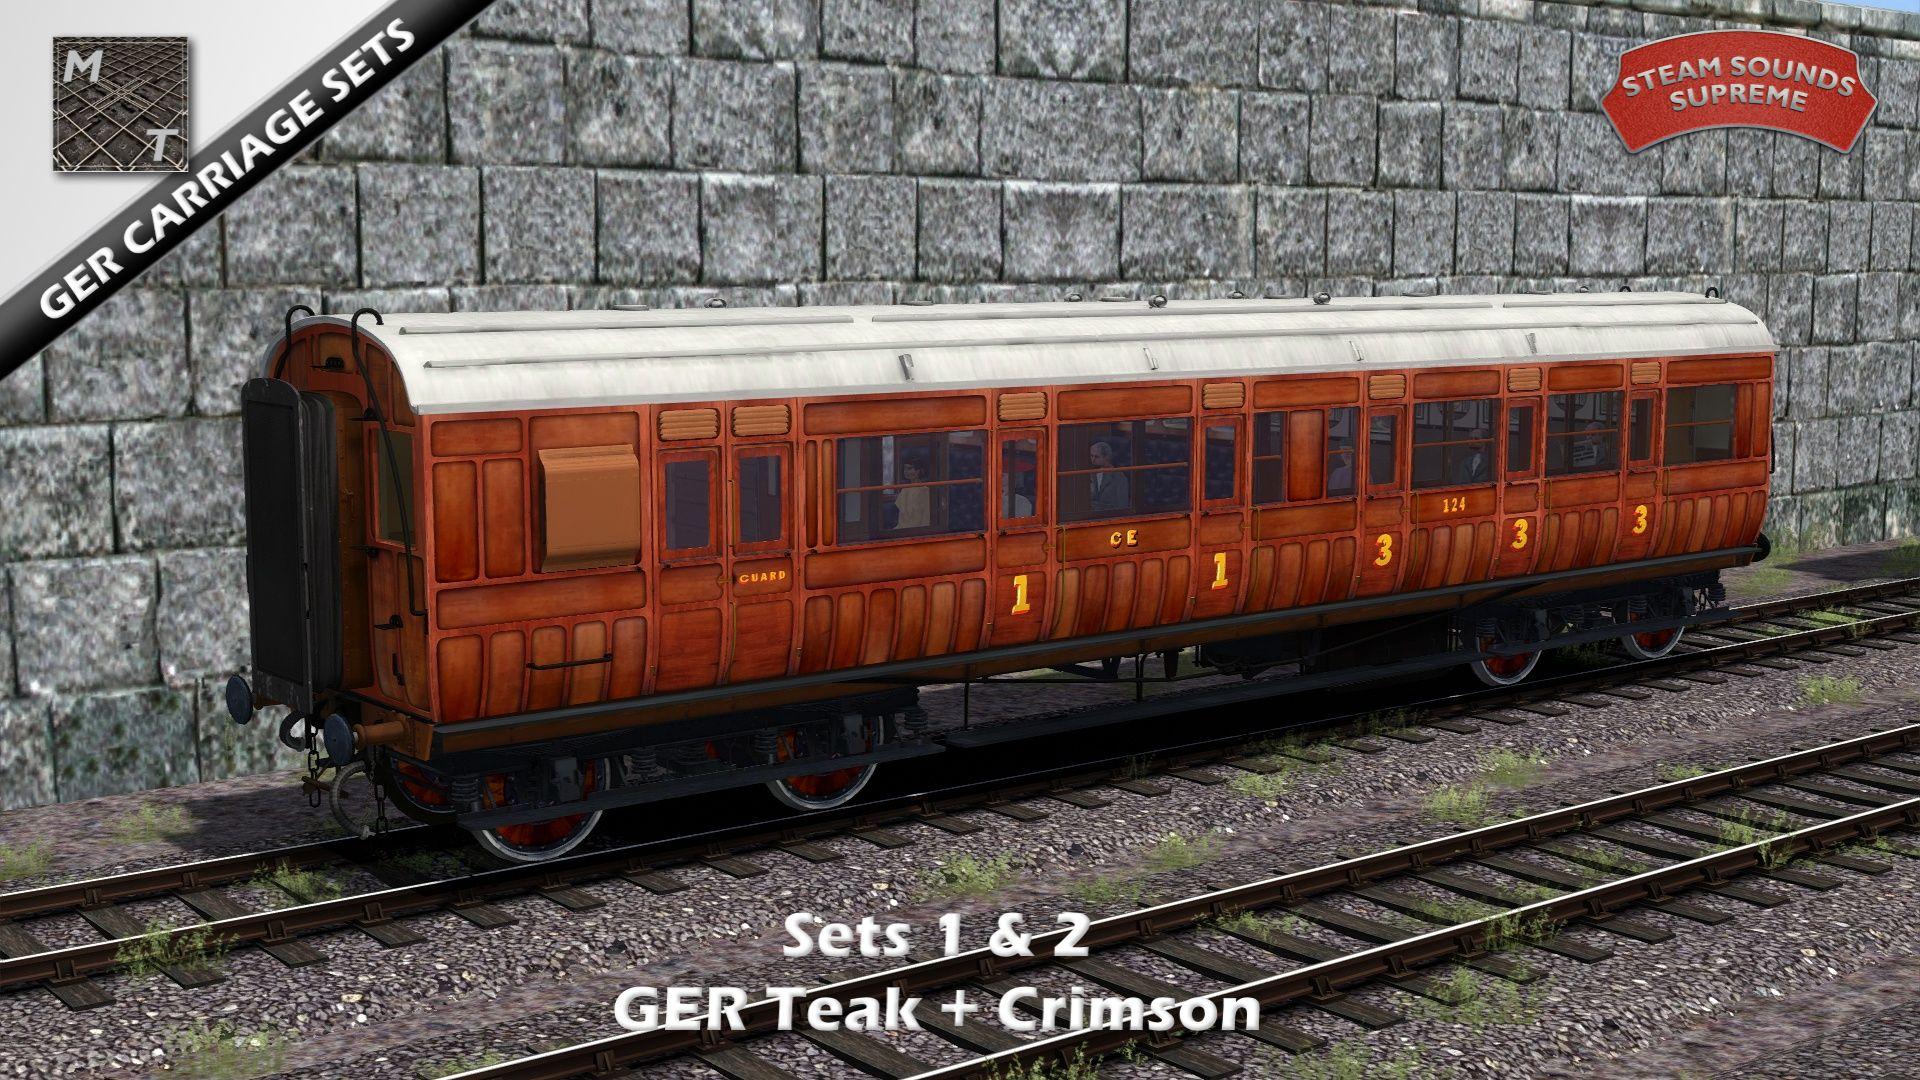 GERCorrSet1-2_06.jpg